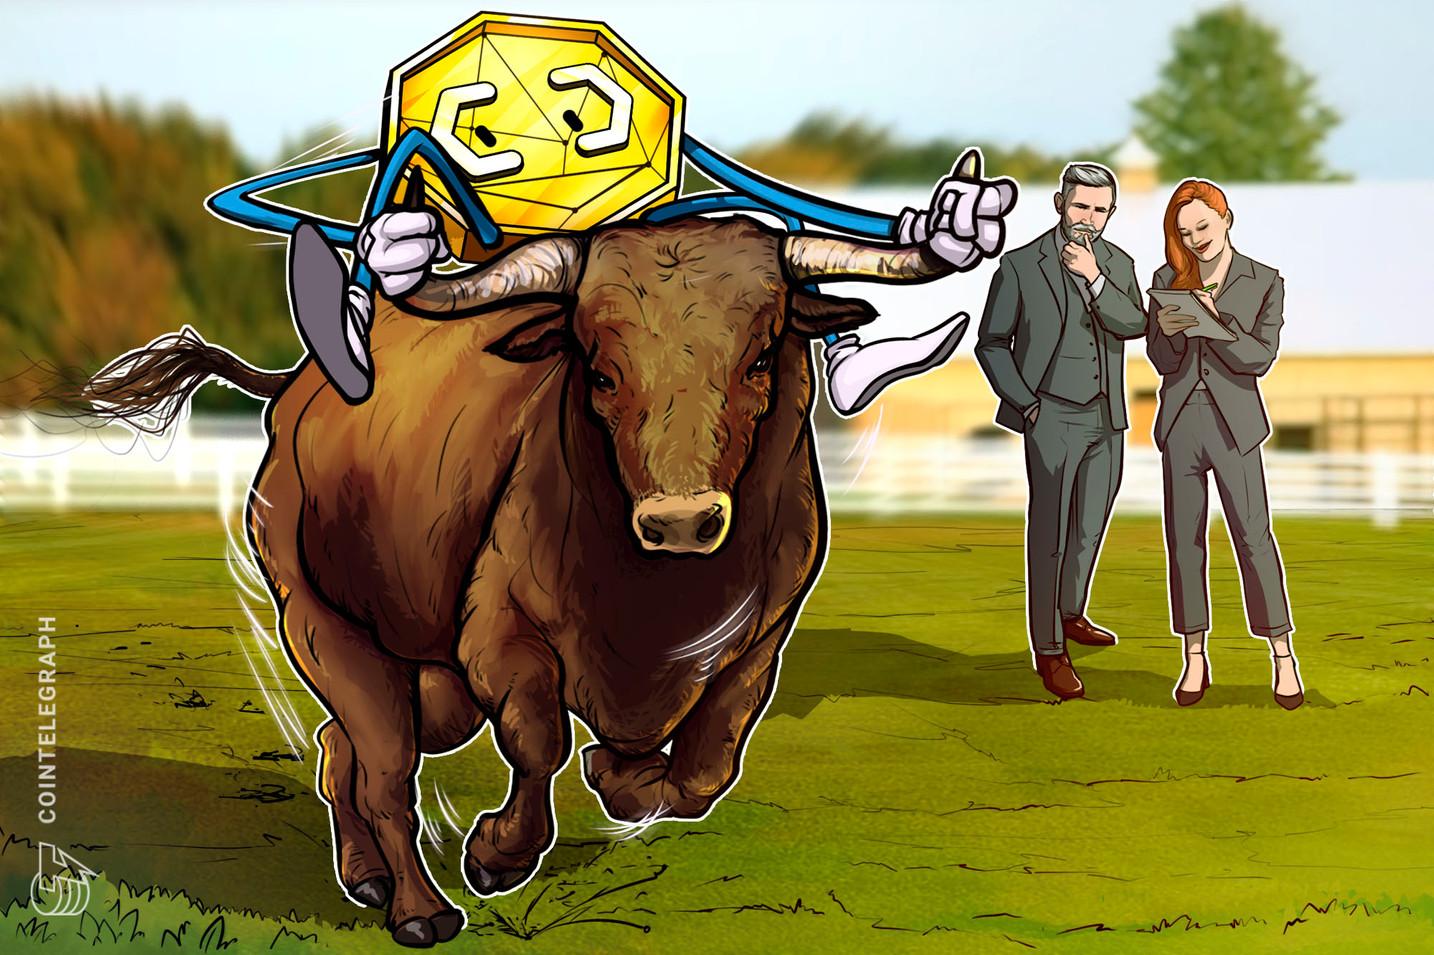 Nova 'bull run' é 'inevitável' para as criptomoedas, diz CEO da Digital Assets Data